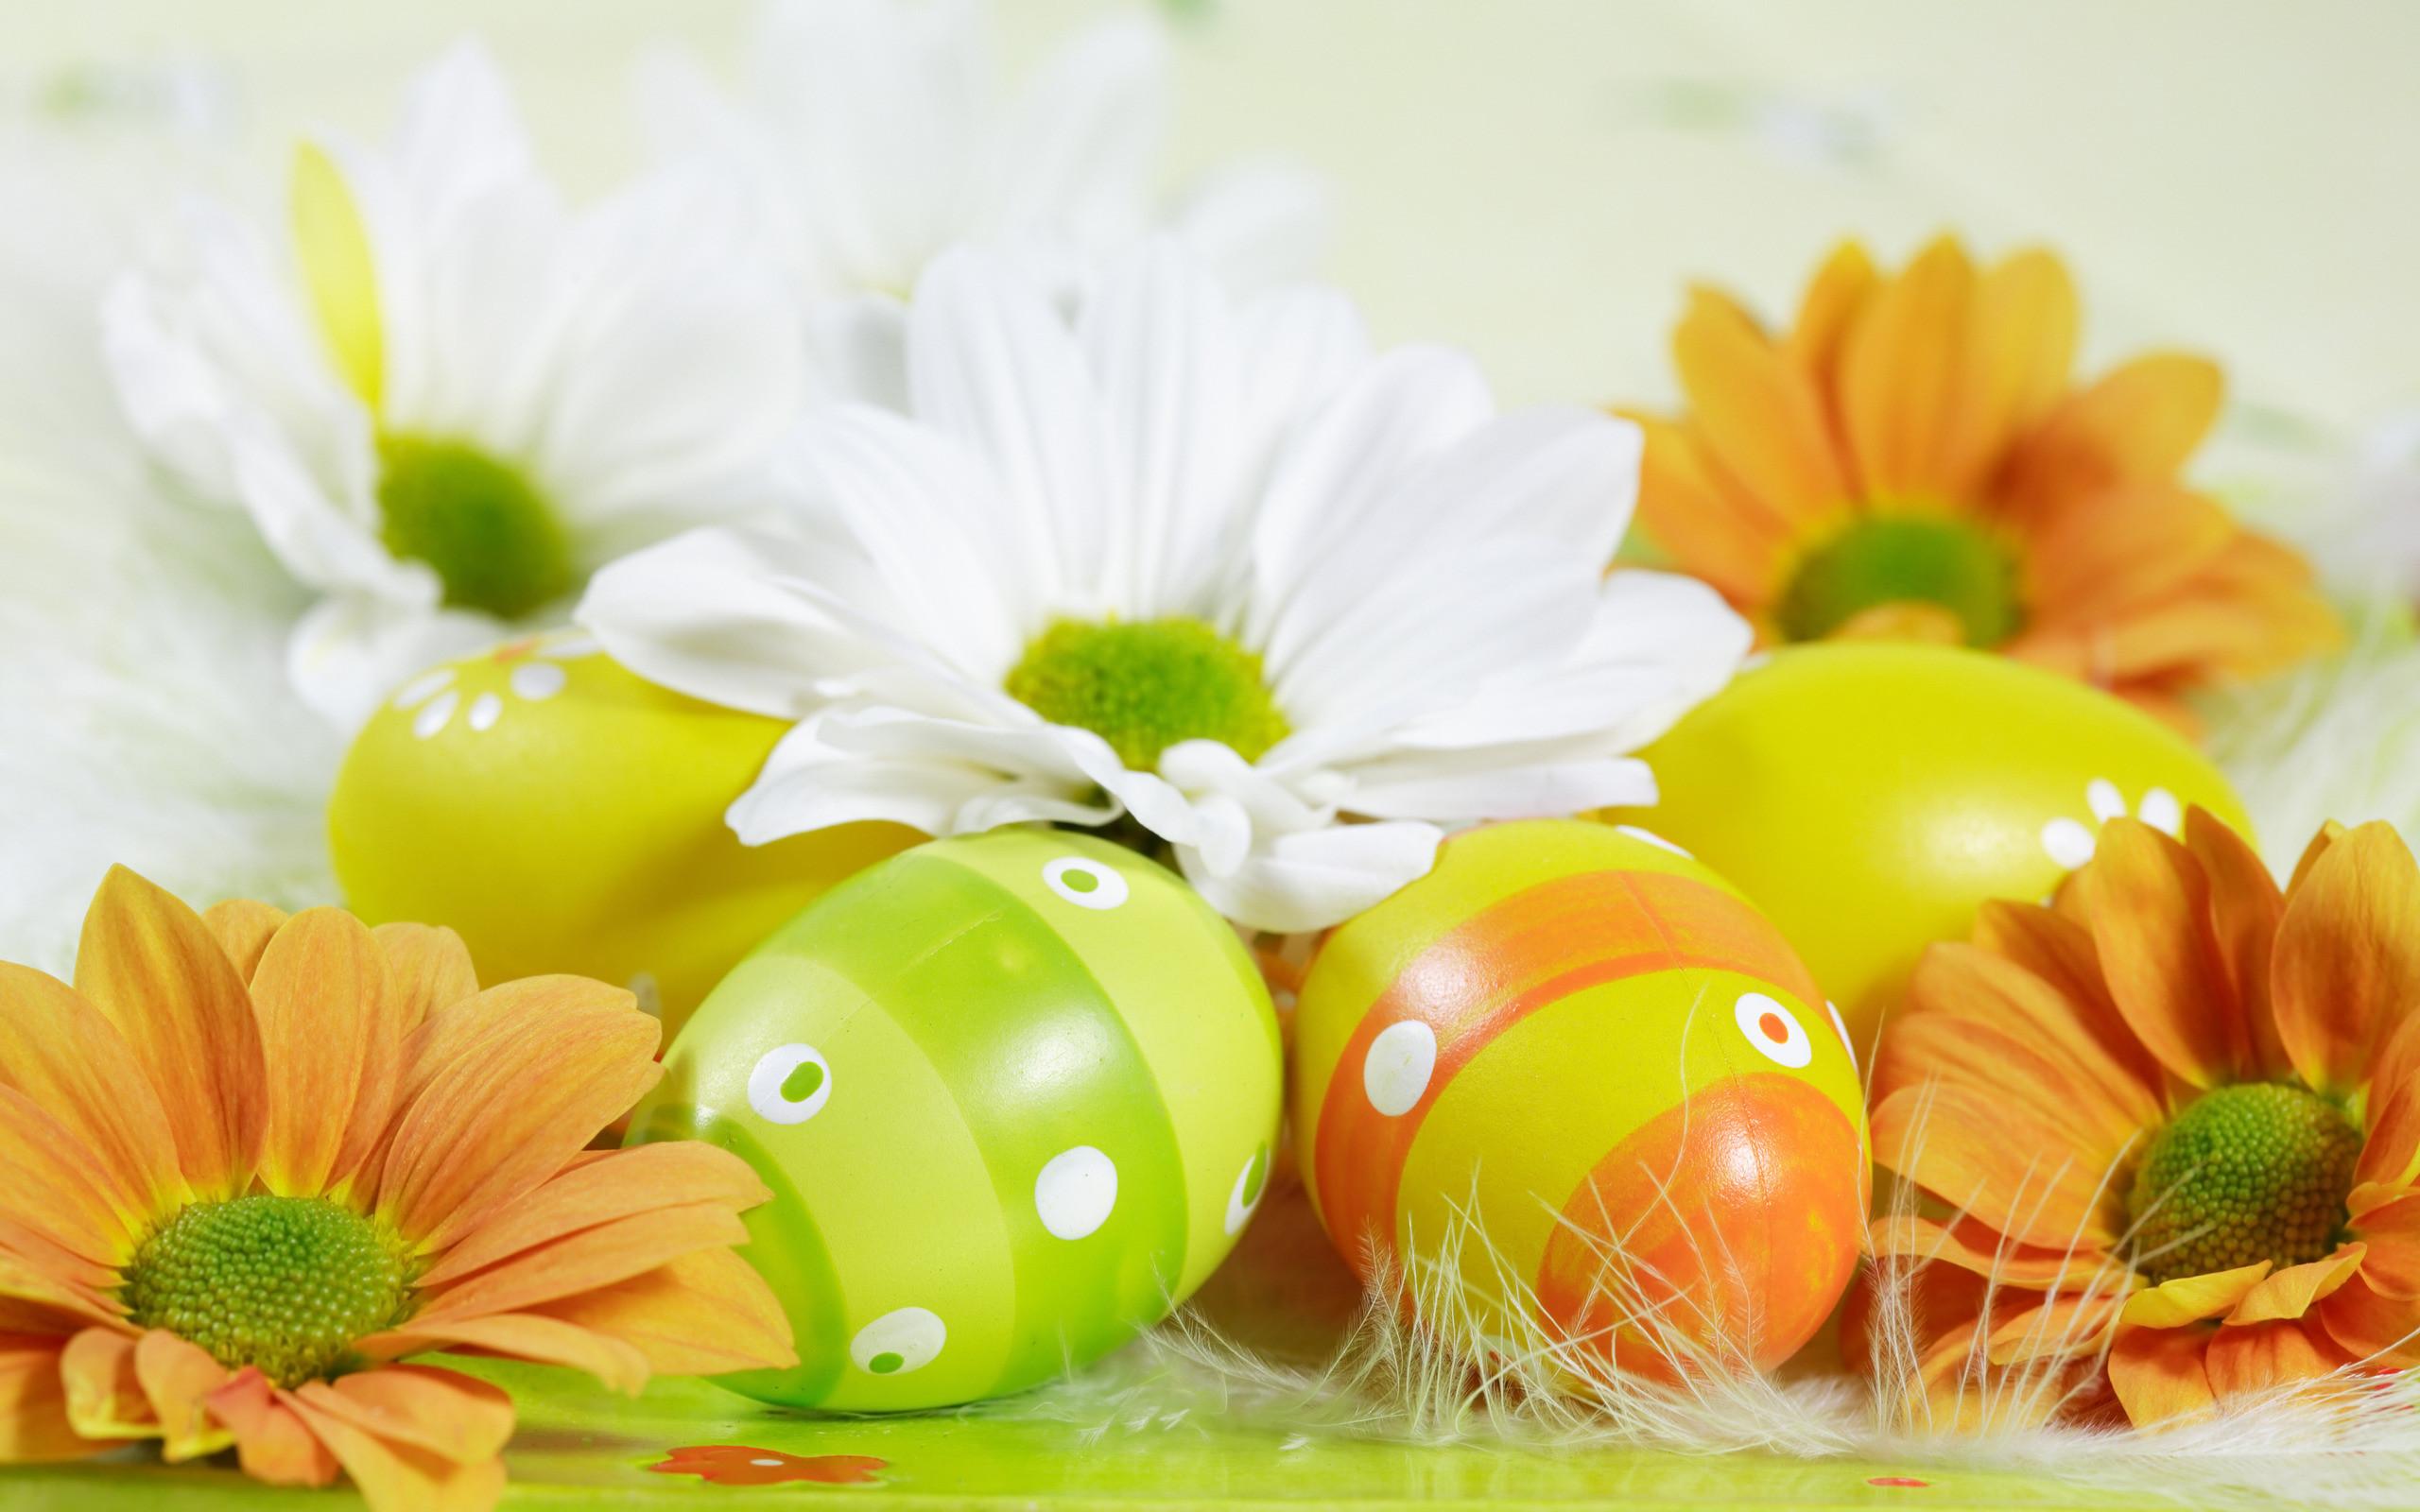 Desktop Wallpaper: Free Easter Desktop Wallpaper